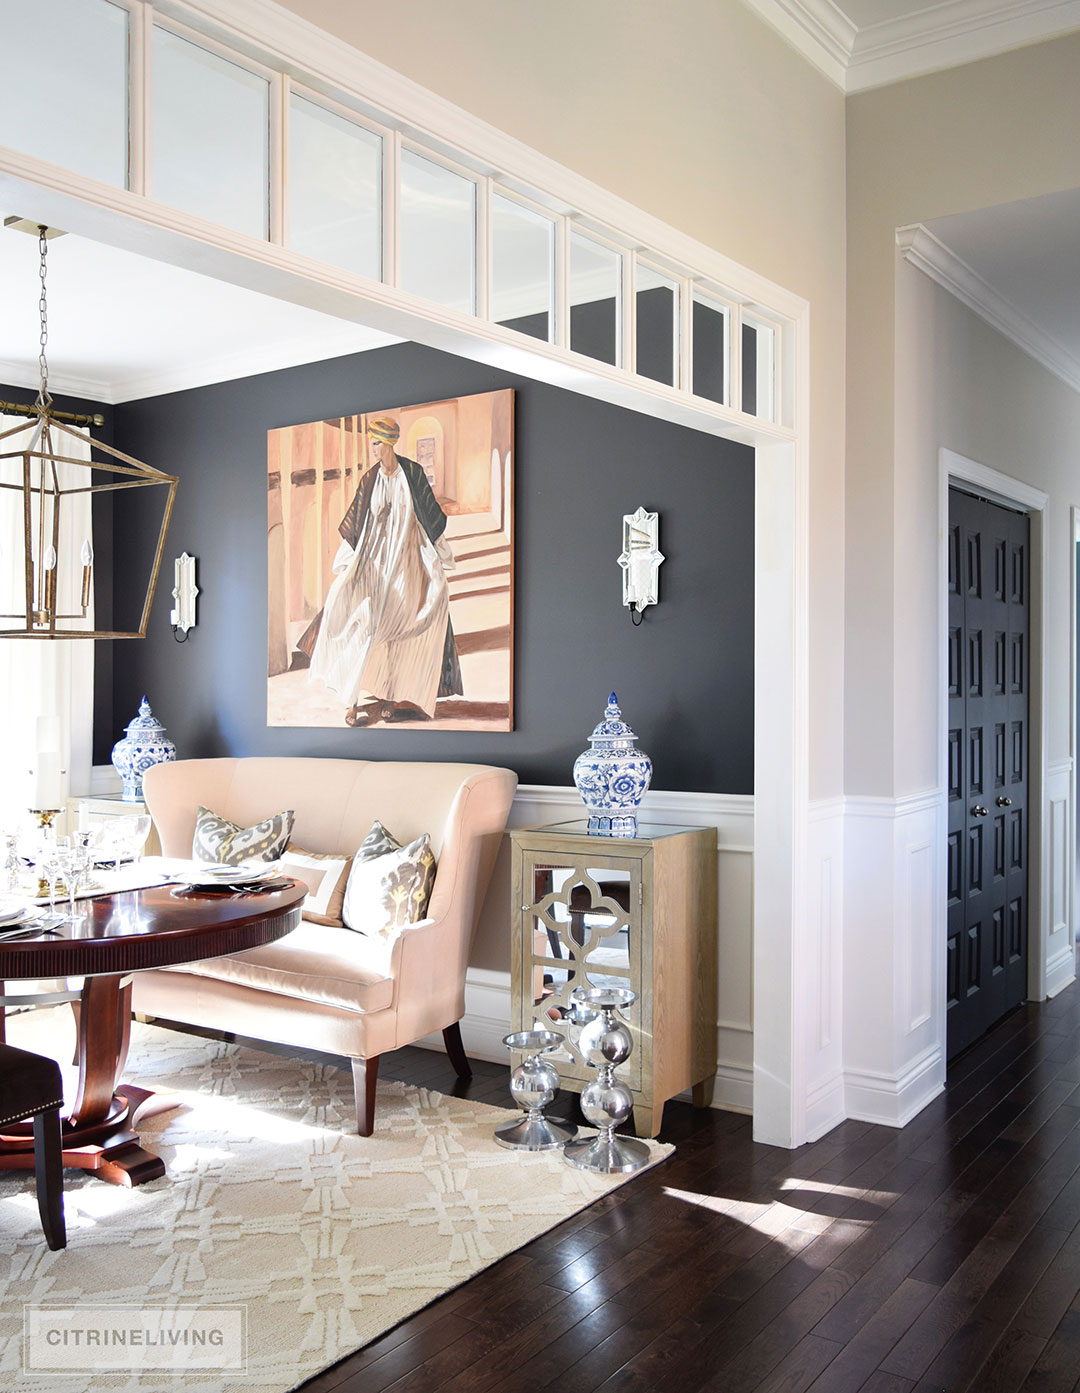 dining-room-black-walls-neutral-rug-beige-settee-ginger-jar